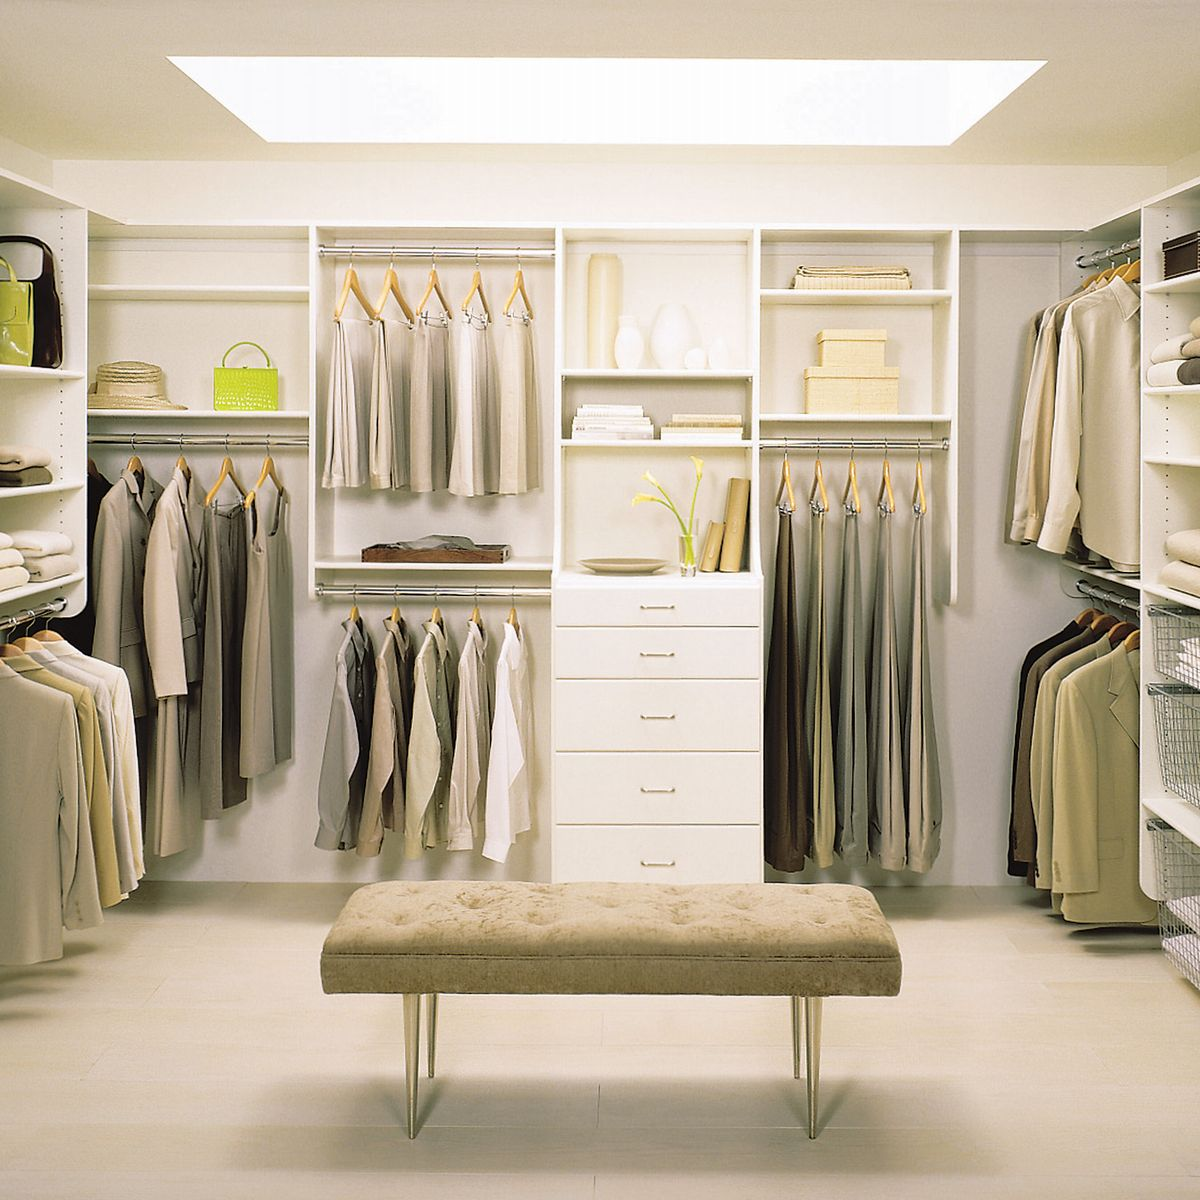 large walk in closet design photo - 6